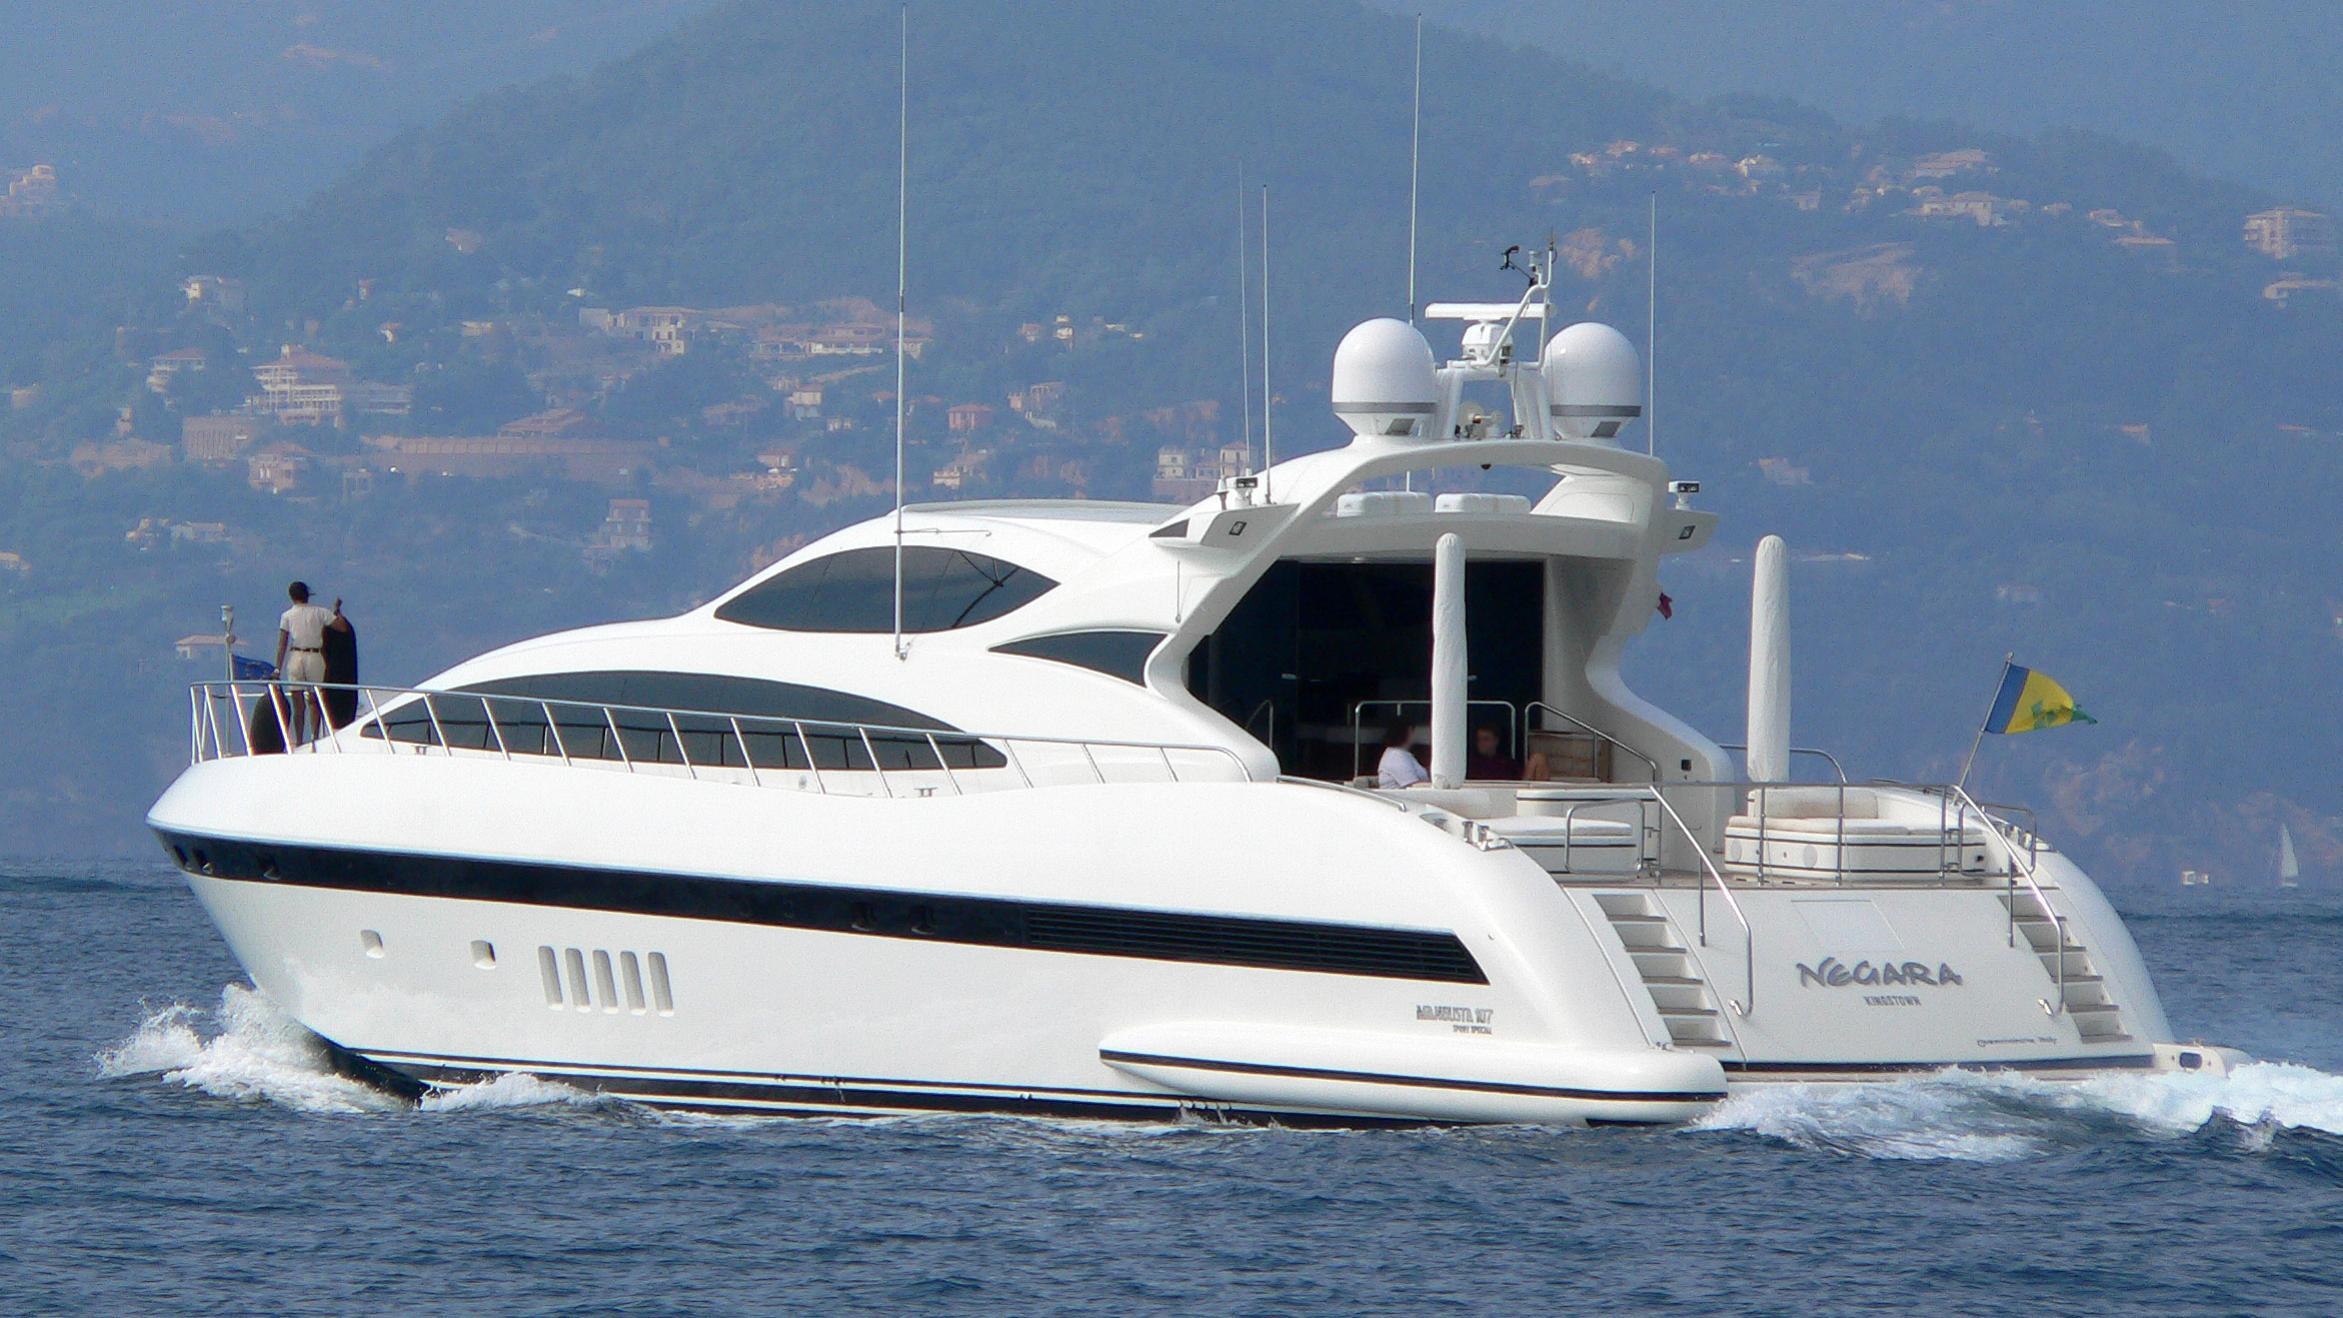 negara-yacht-exterior